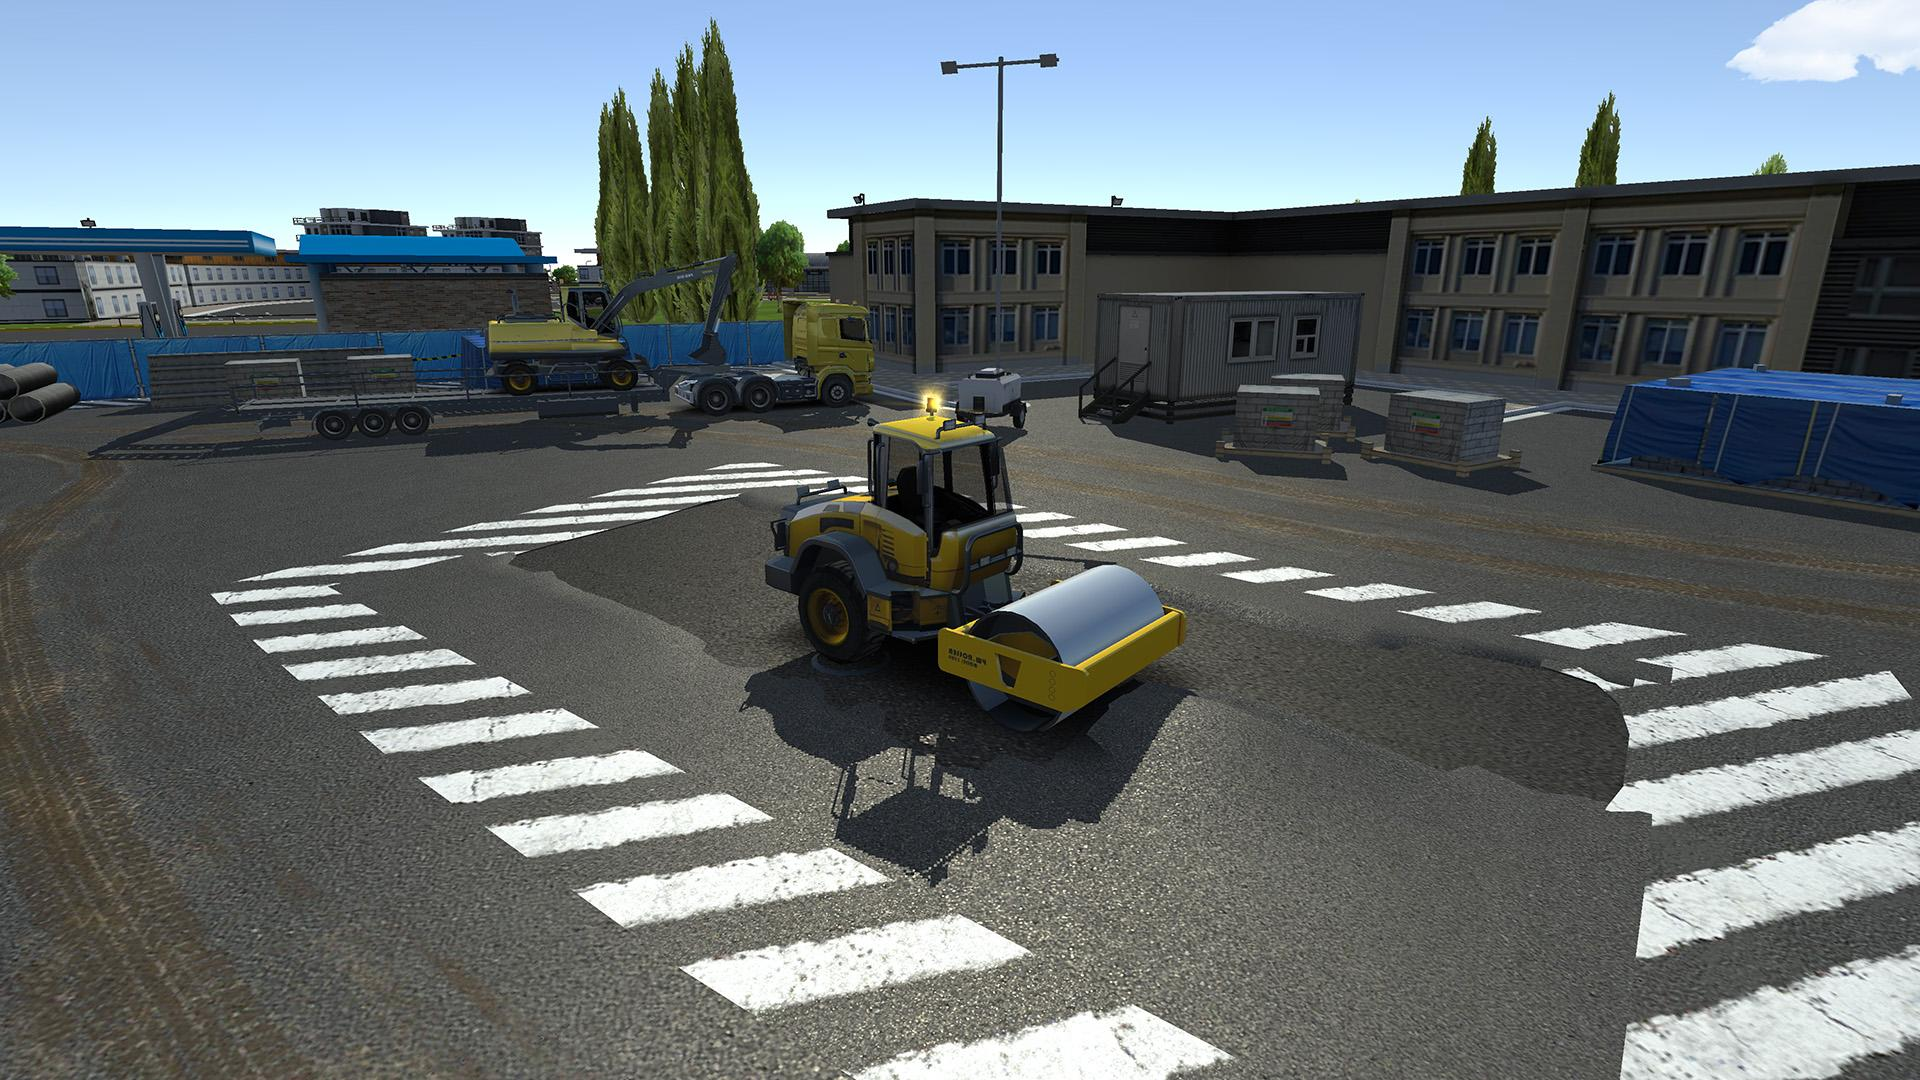 Drive Simulator 2020 captura de tela 1